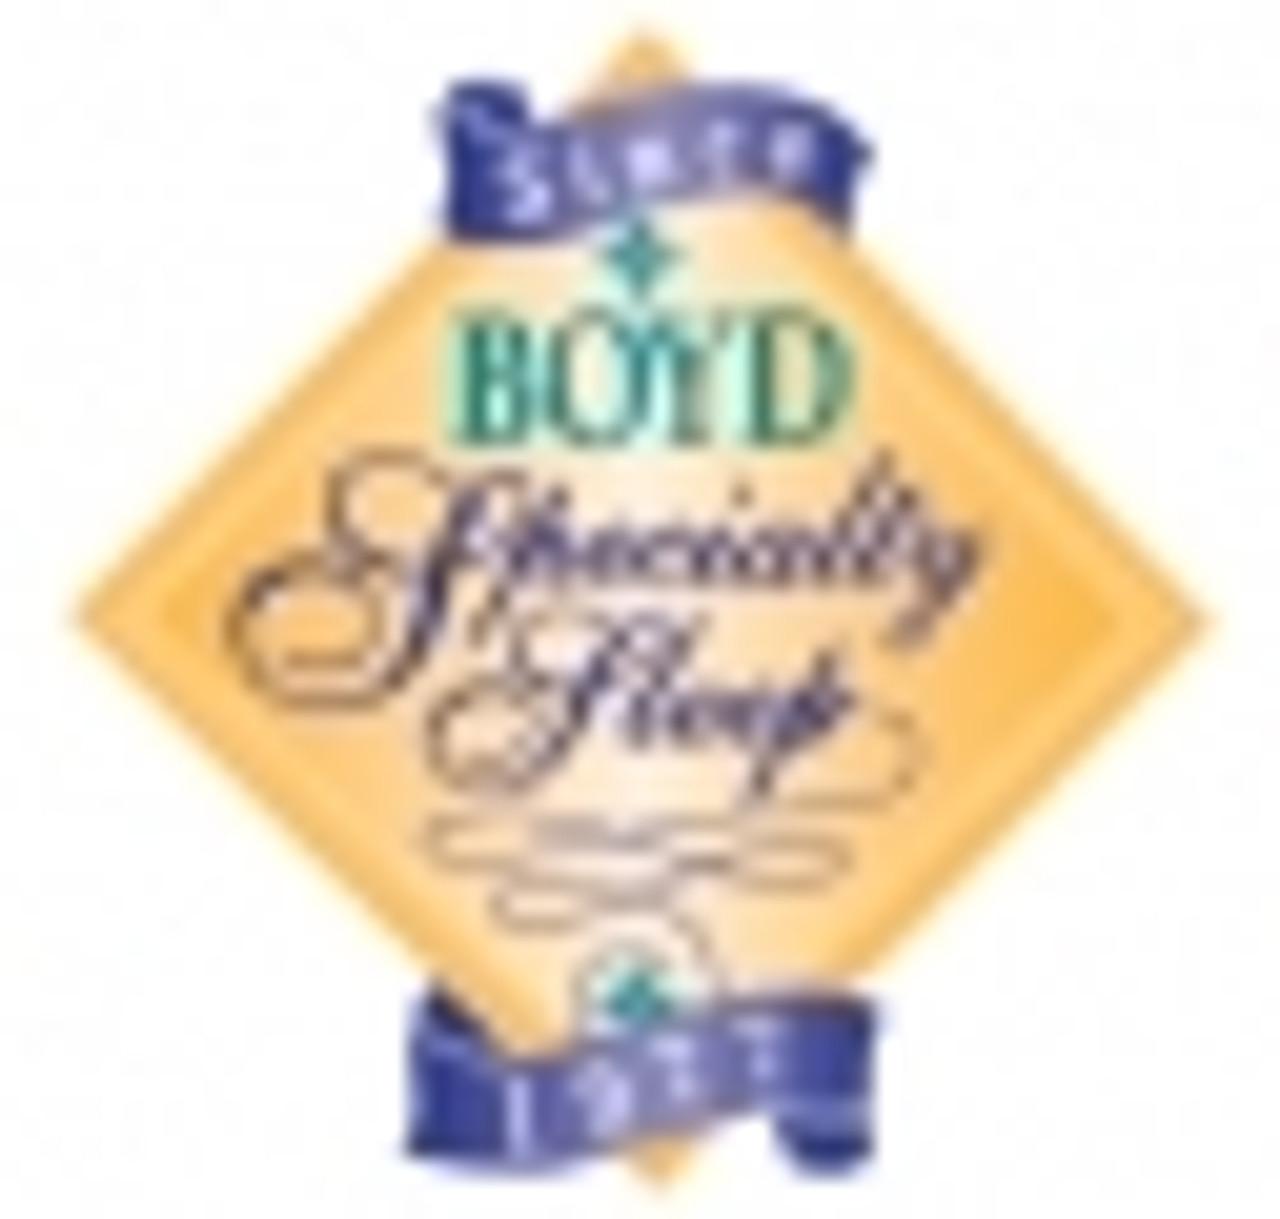 Boyd Flotation Hardside Waterbeds